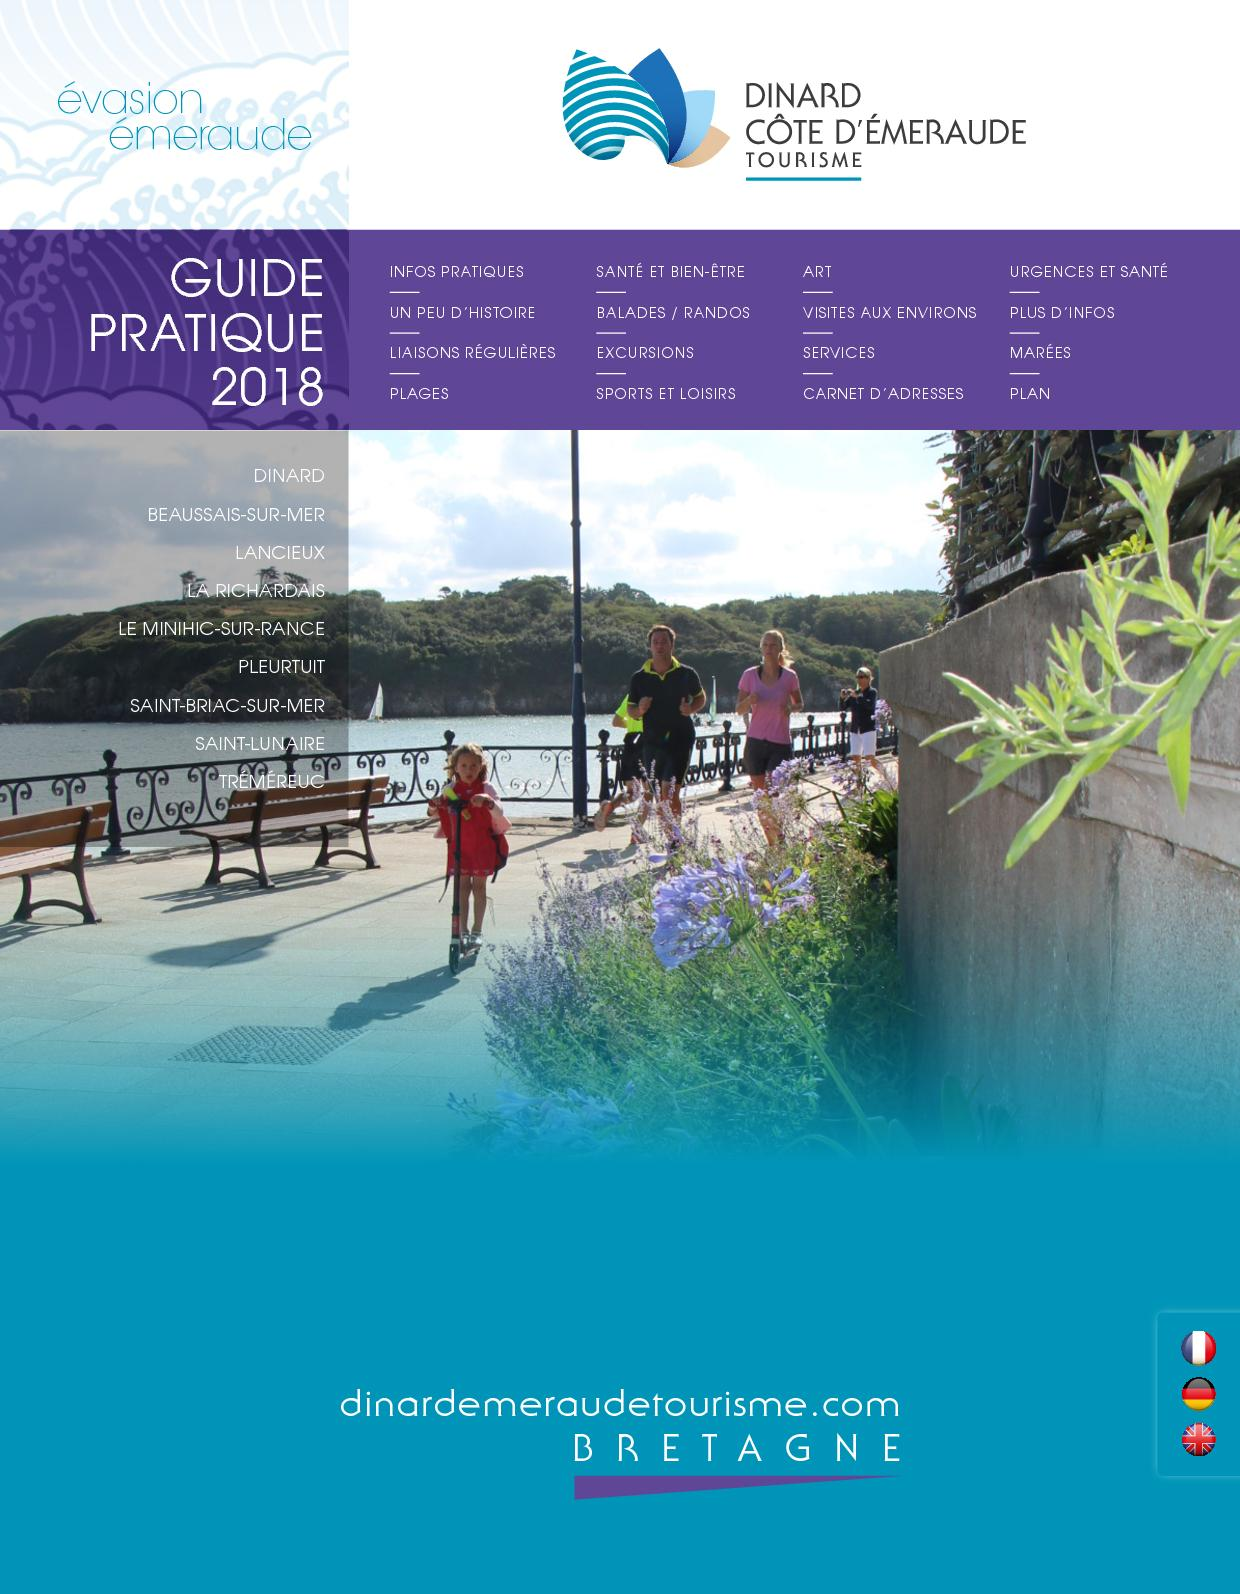 Calaméo 2018 Guide Dinard Pratique Bd IWEDH29